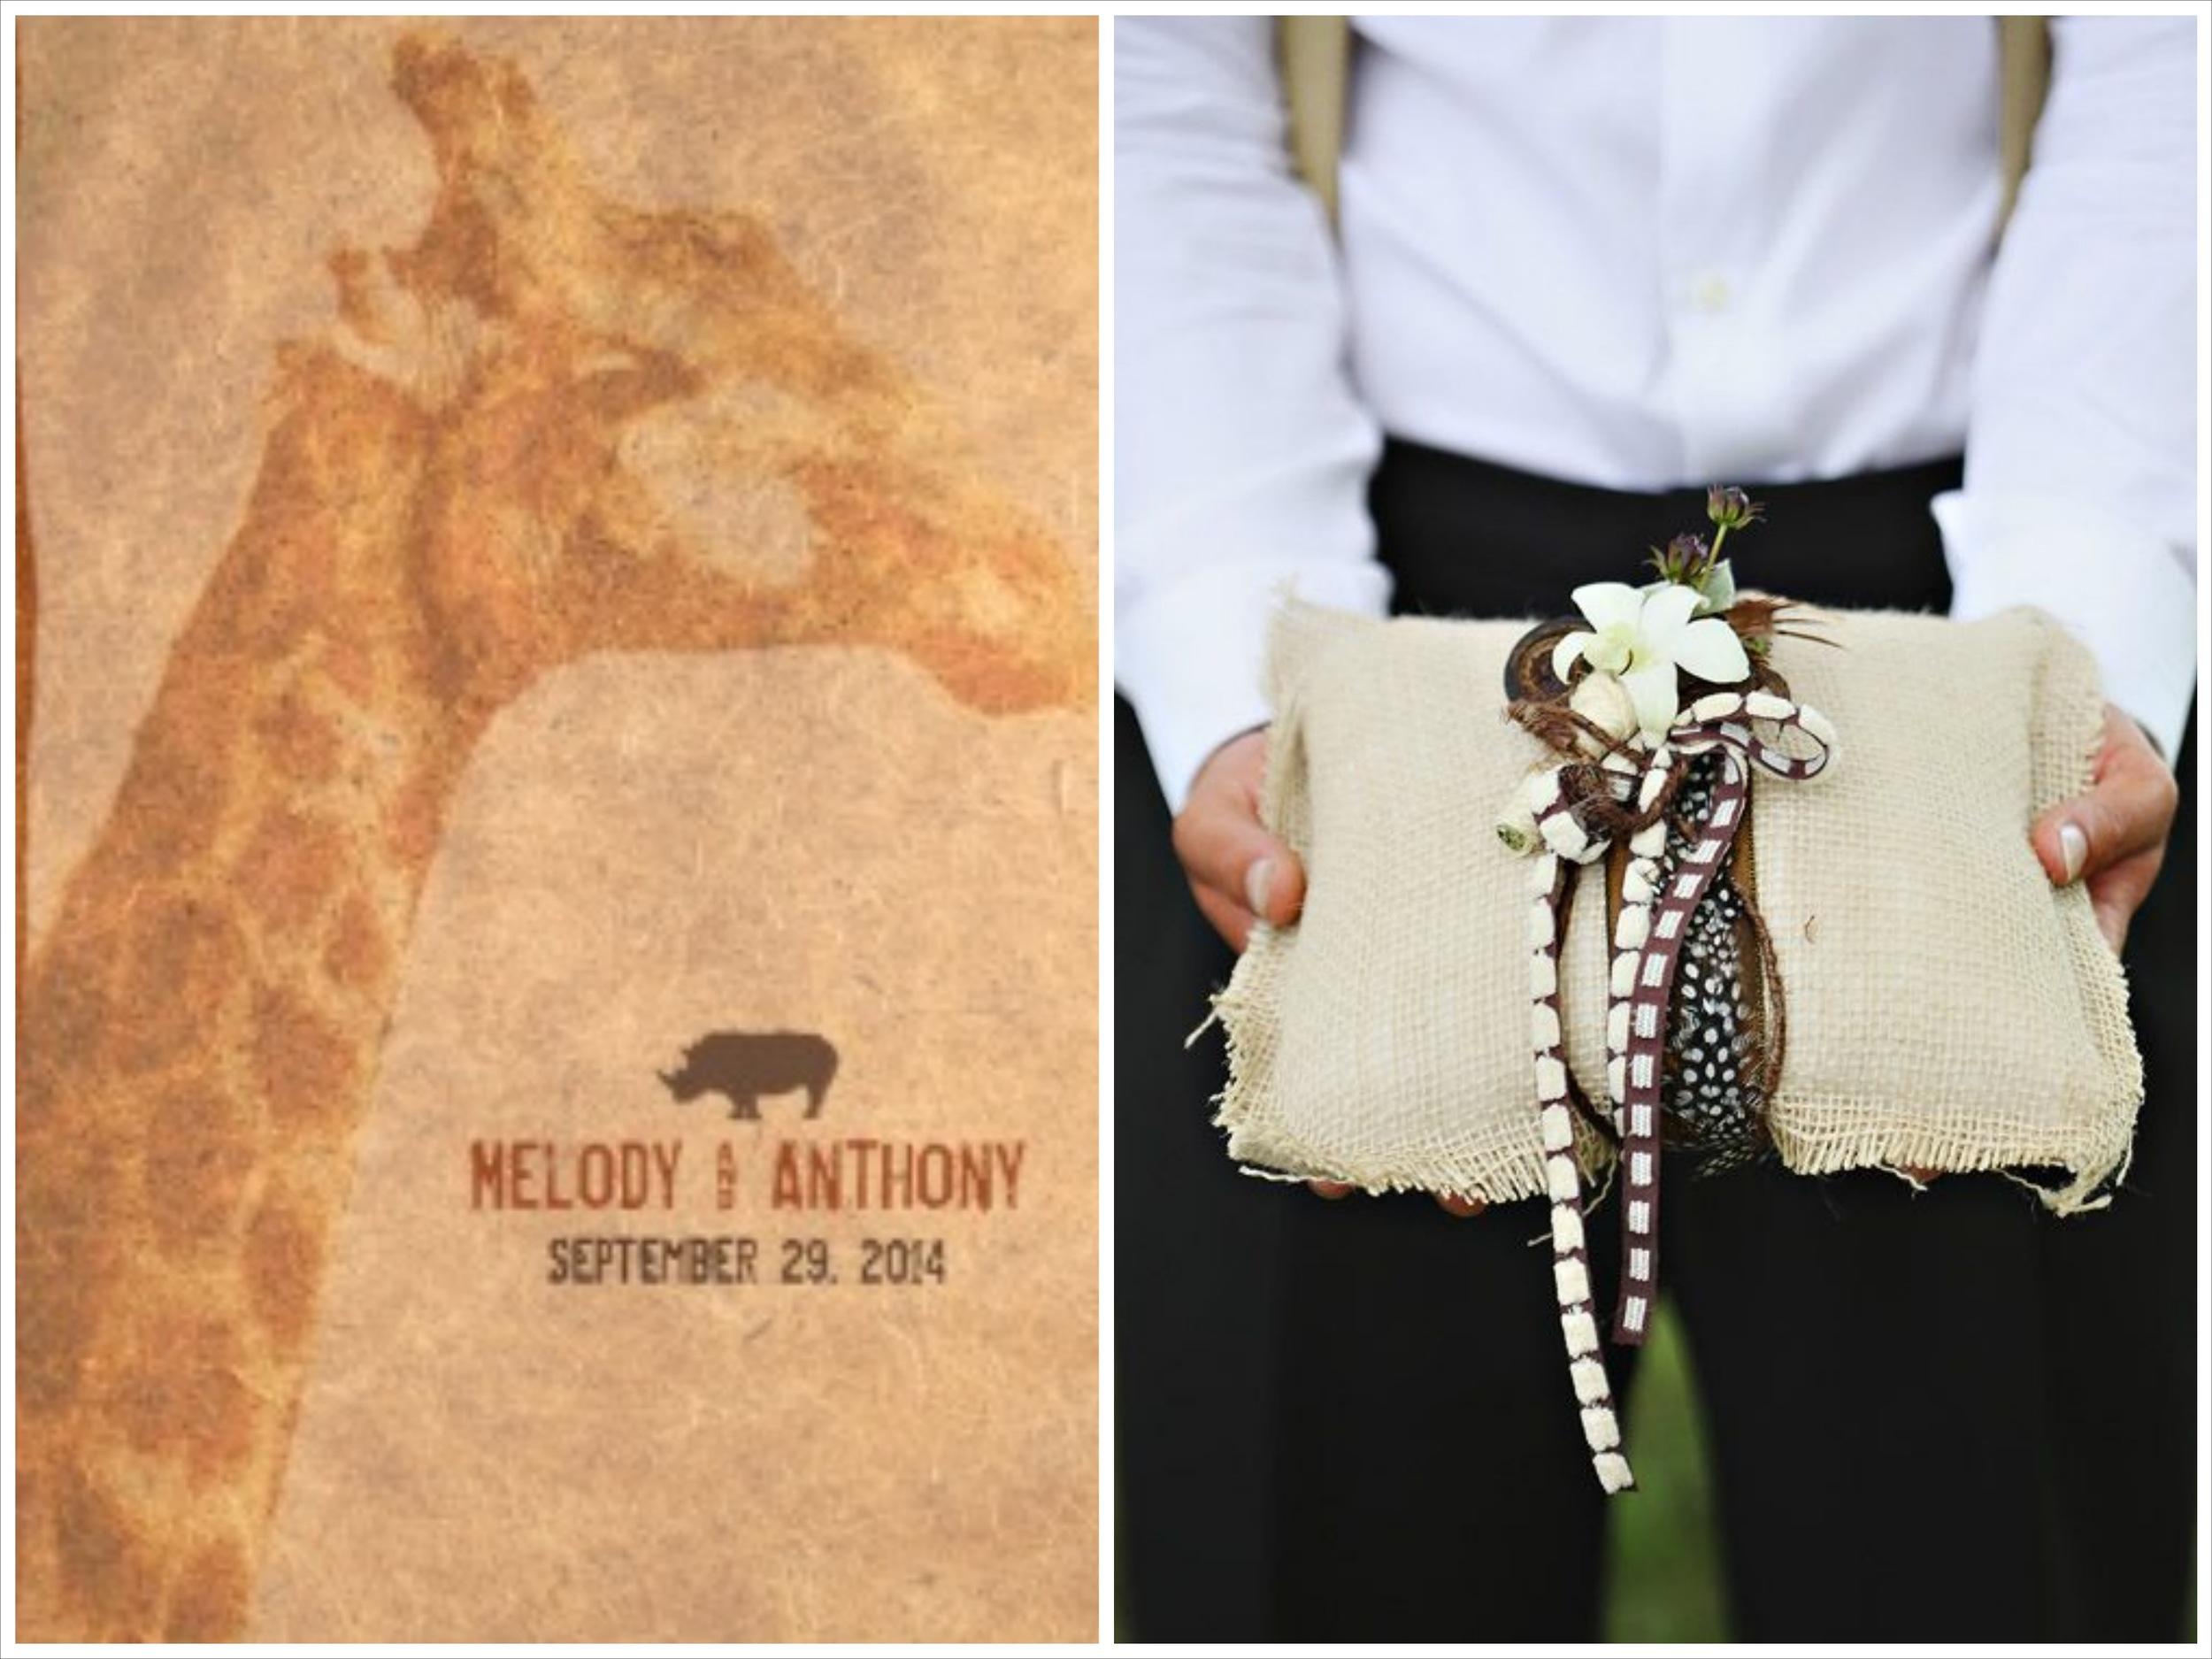 safari wedding invitation and ring bearer pillow